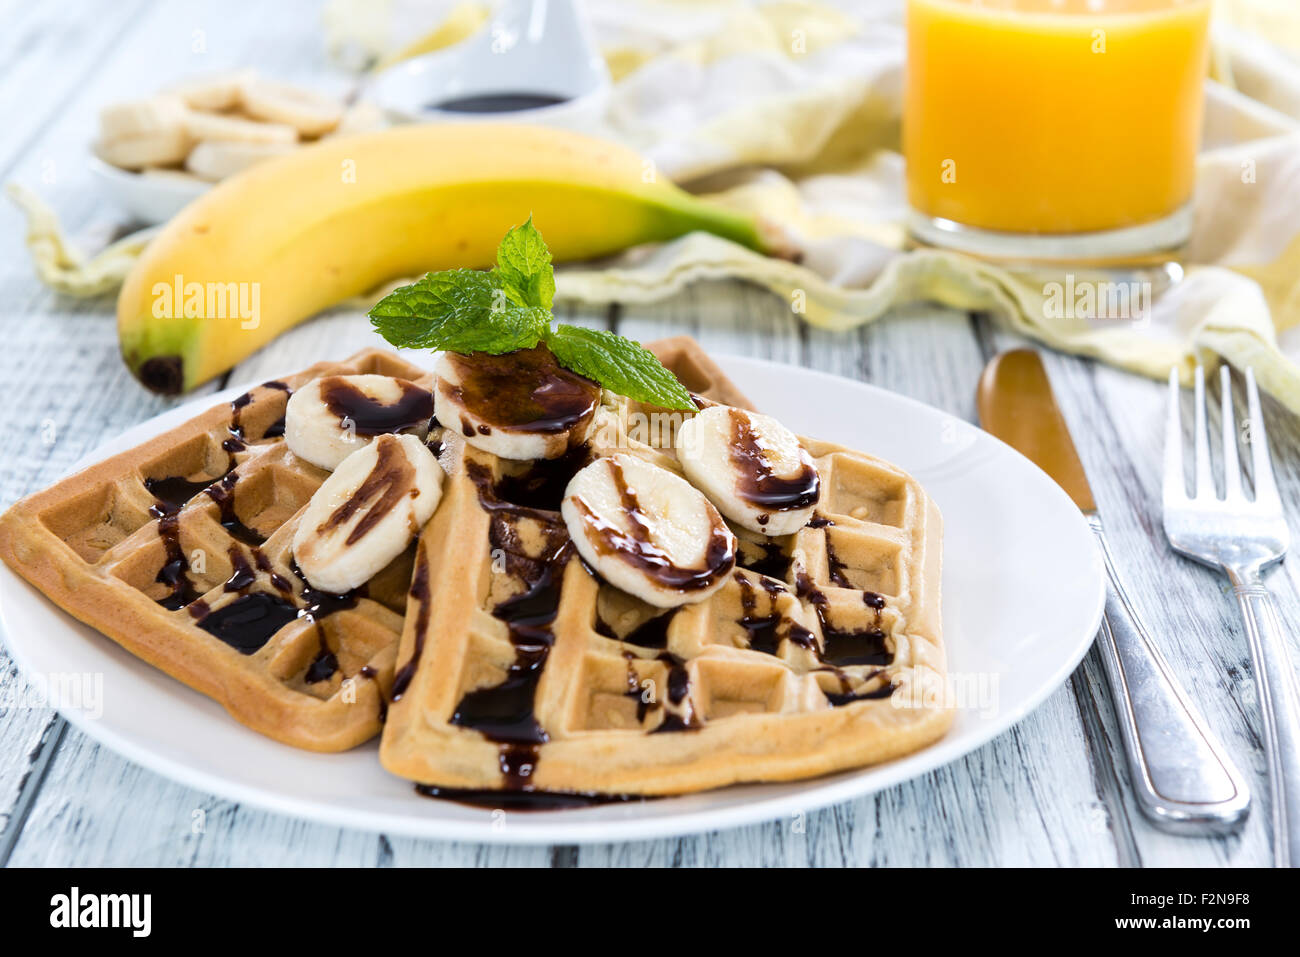 Sweet Breakfast (Waffles with Bananas and creamy Chocolate Sauce) - Stock Image